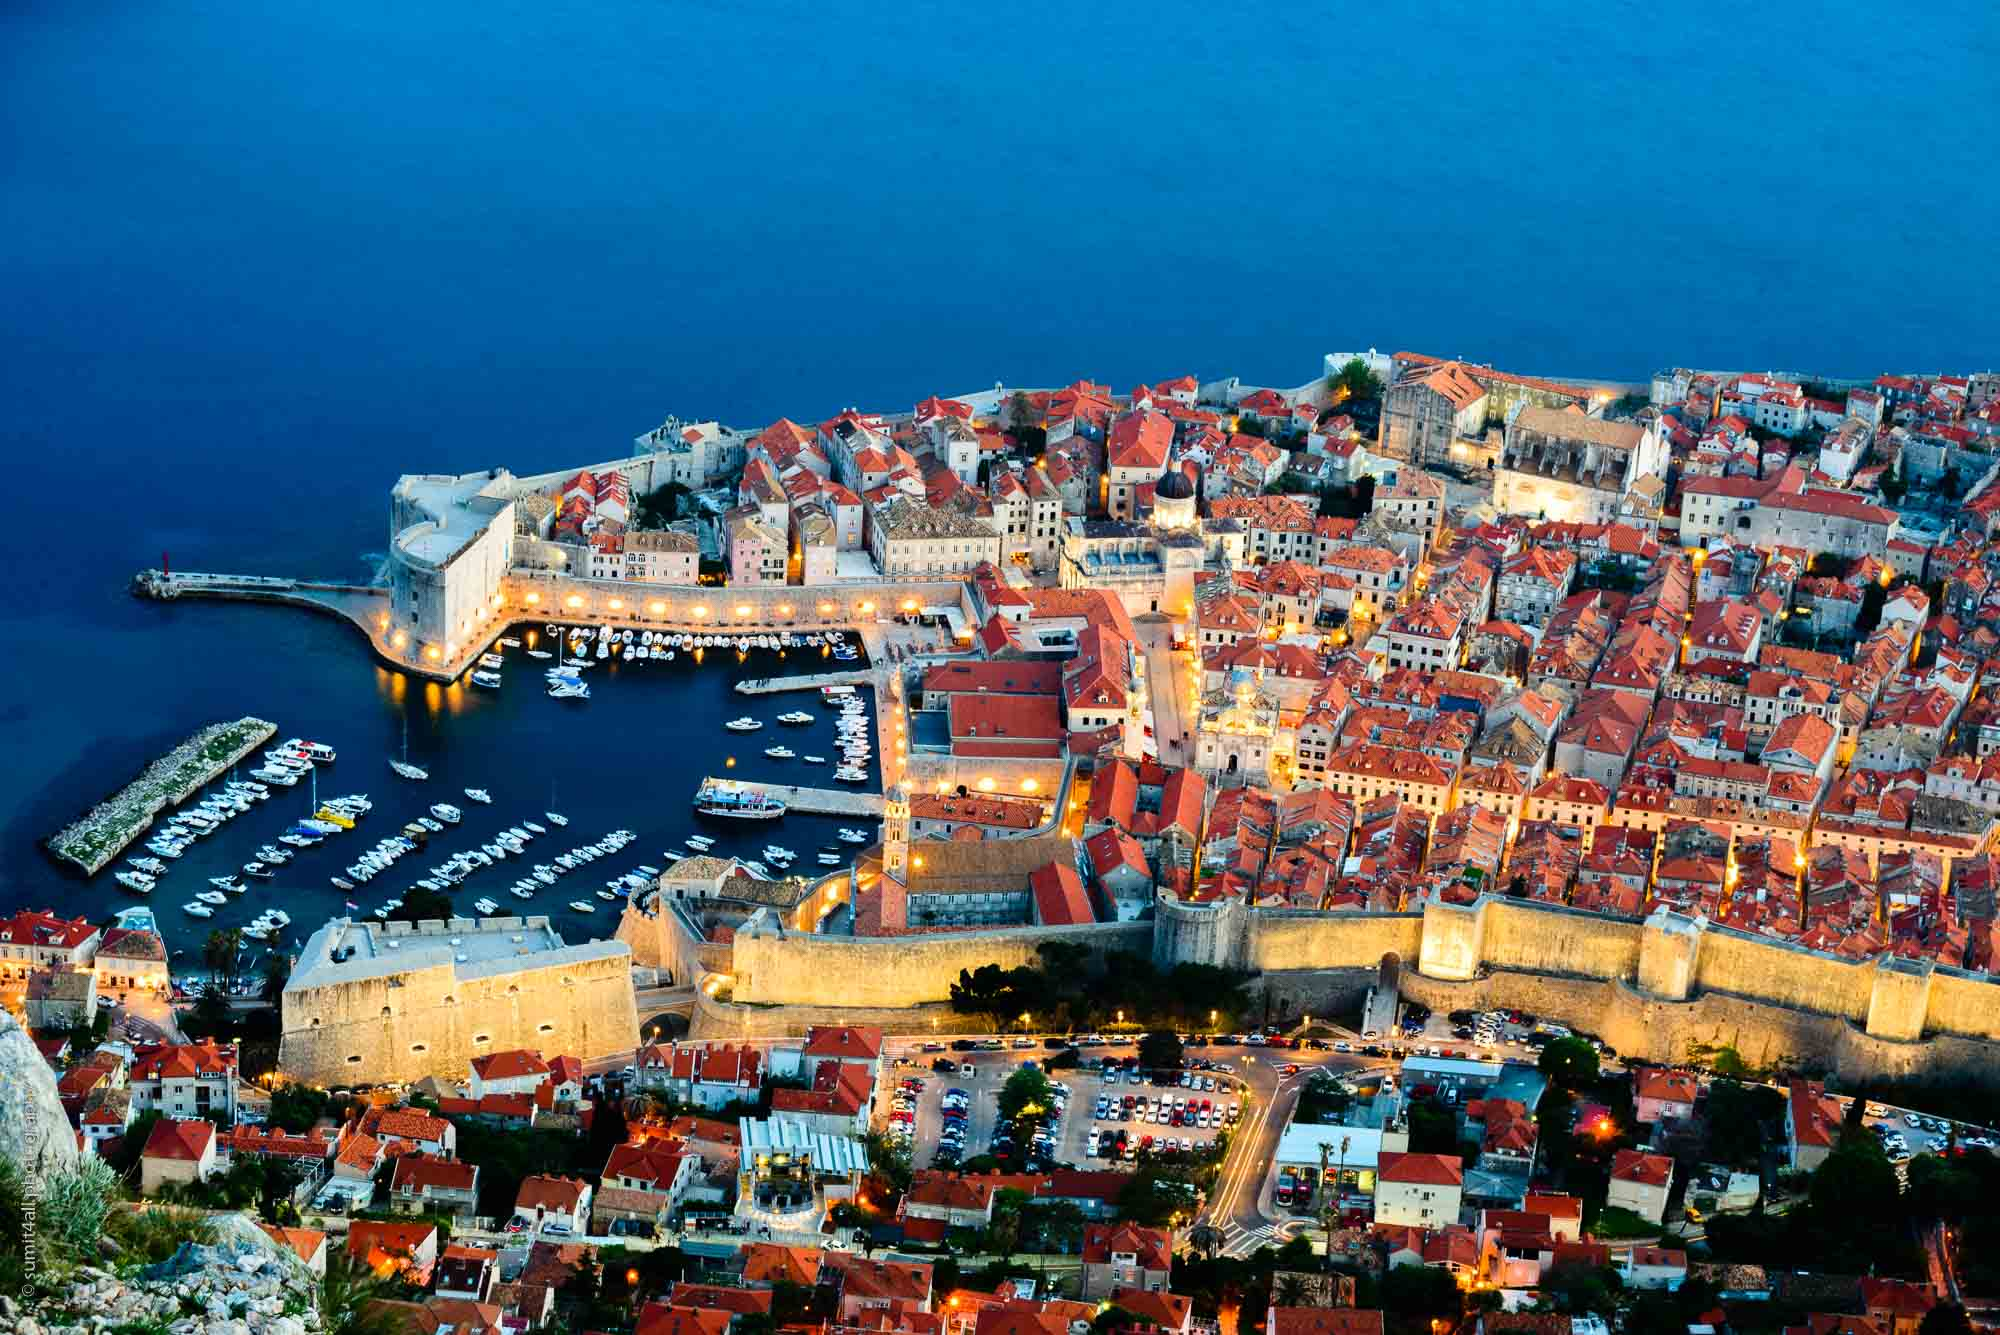 Evening colors in Dubrovnik, Croatia